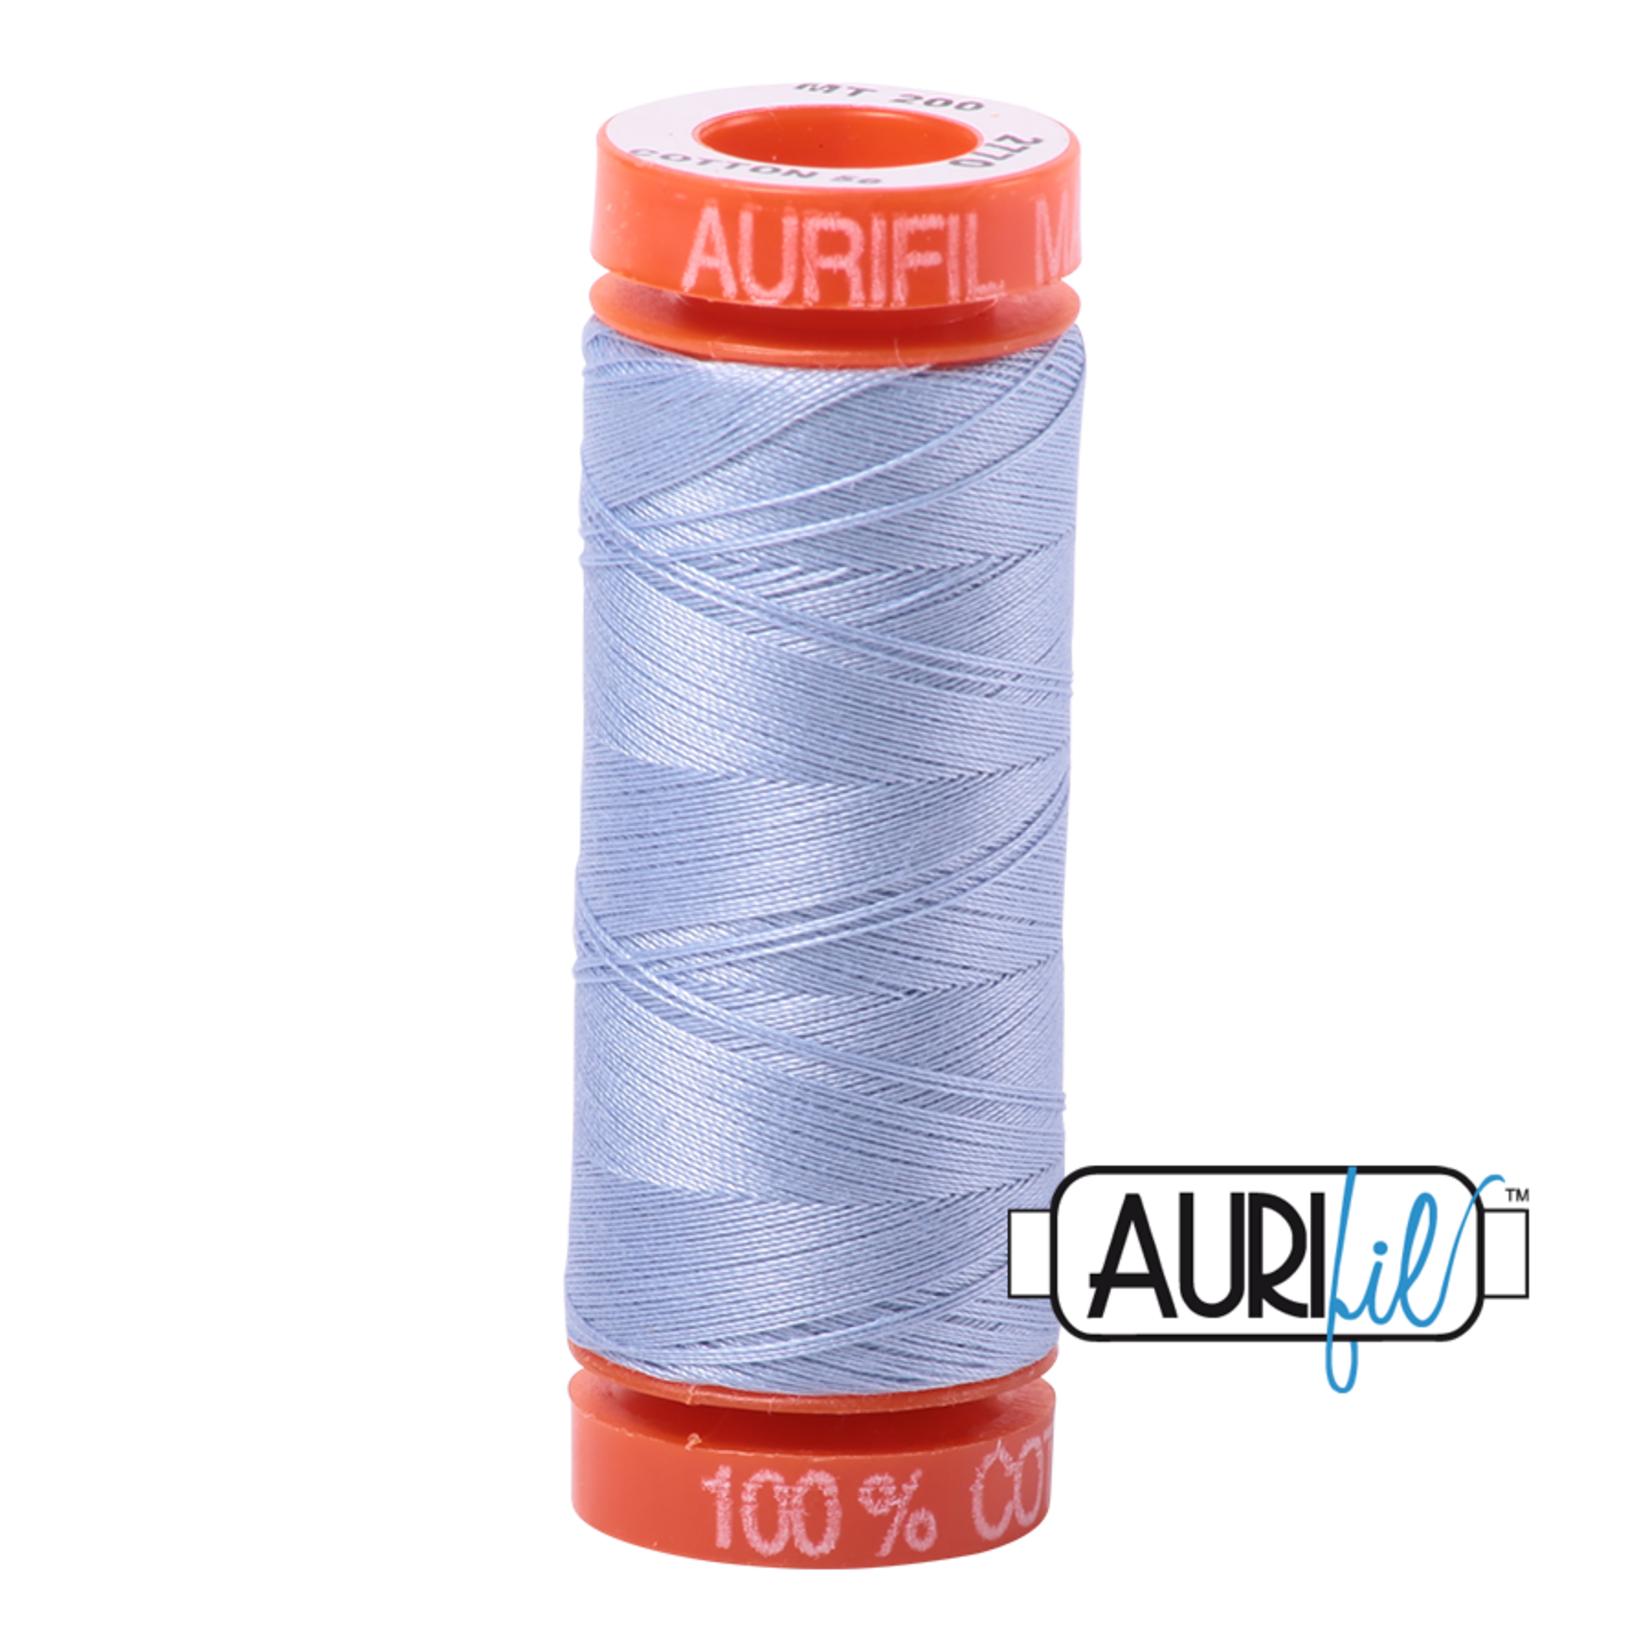 AURIFIL AURIFIL 50 WT Very Light Delft 2770 Small Spool